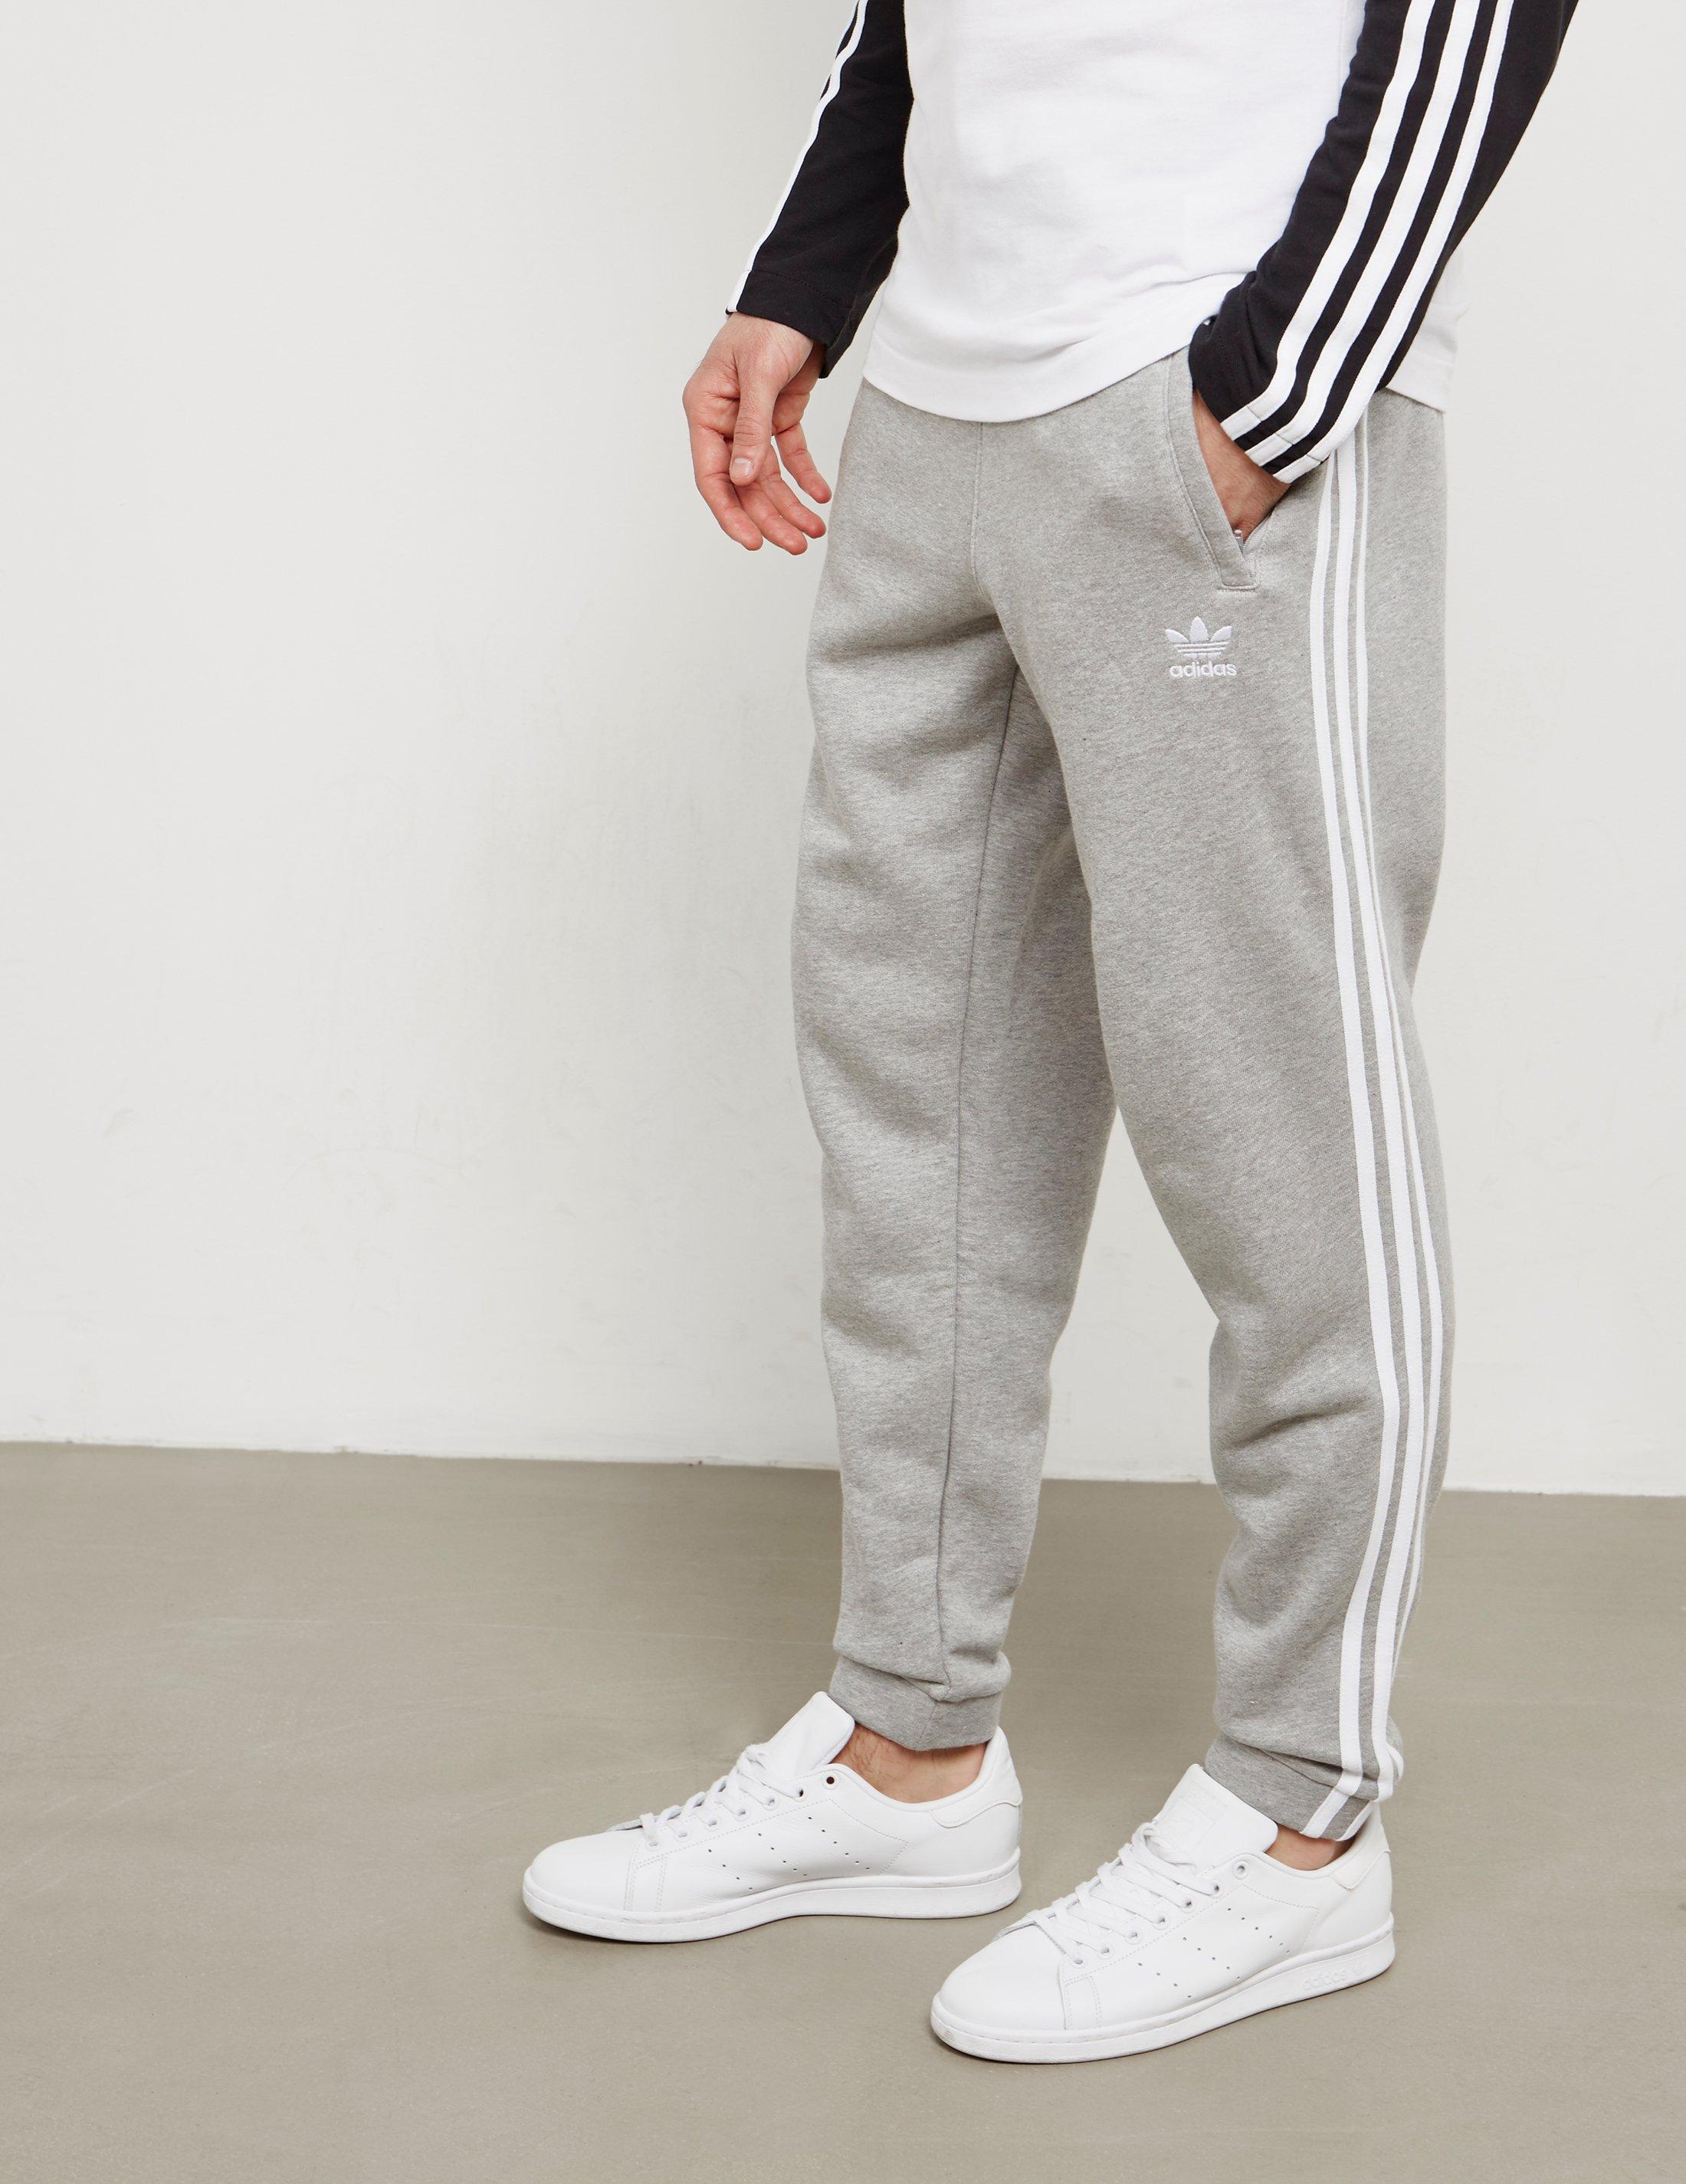 adidas pants for men